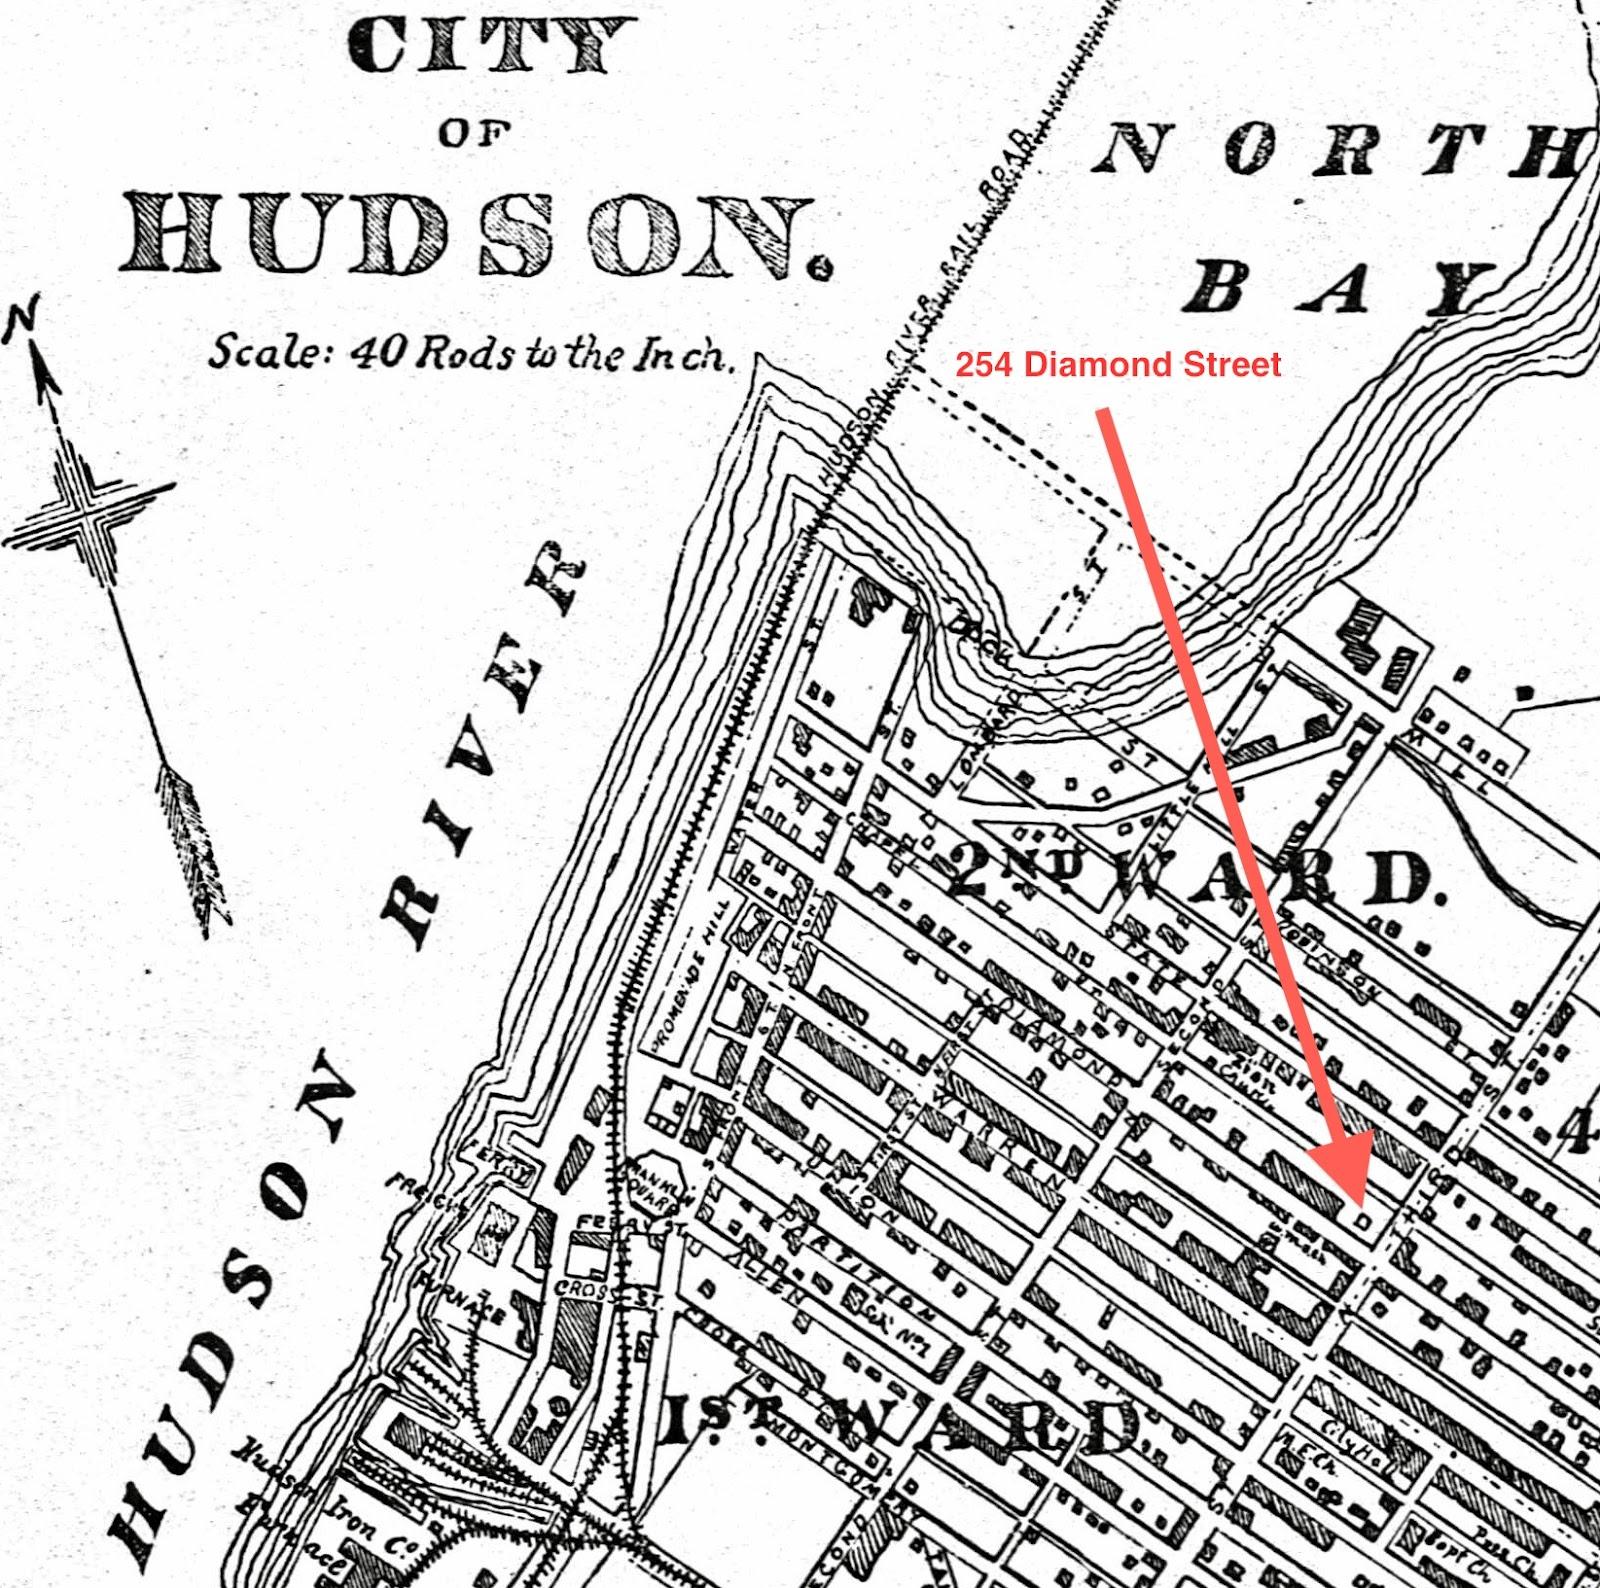 Hudson Ny Map >> Going The Extra Yad My Genealogy Journey To Hudson Ny Part 2